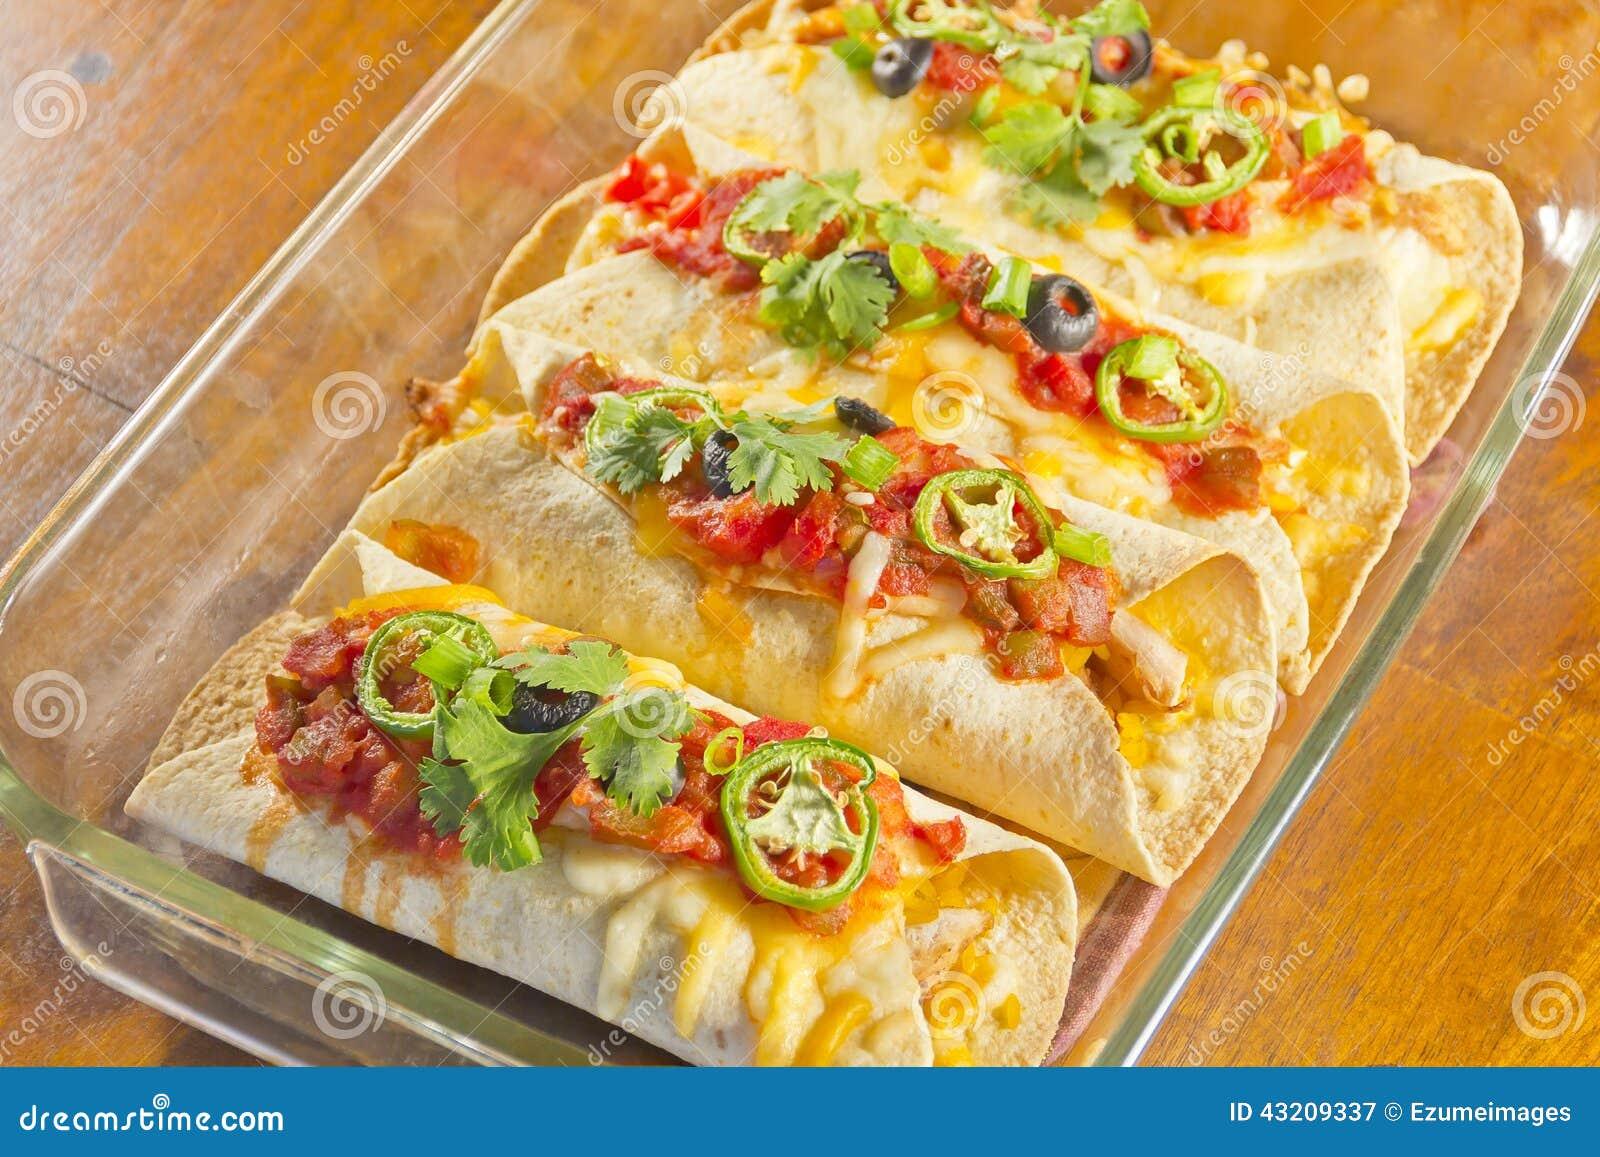 Enchilada-Kasserolle